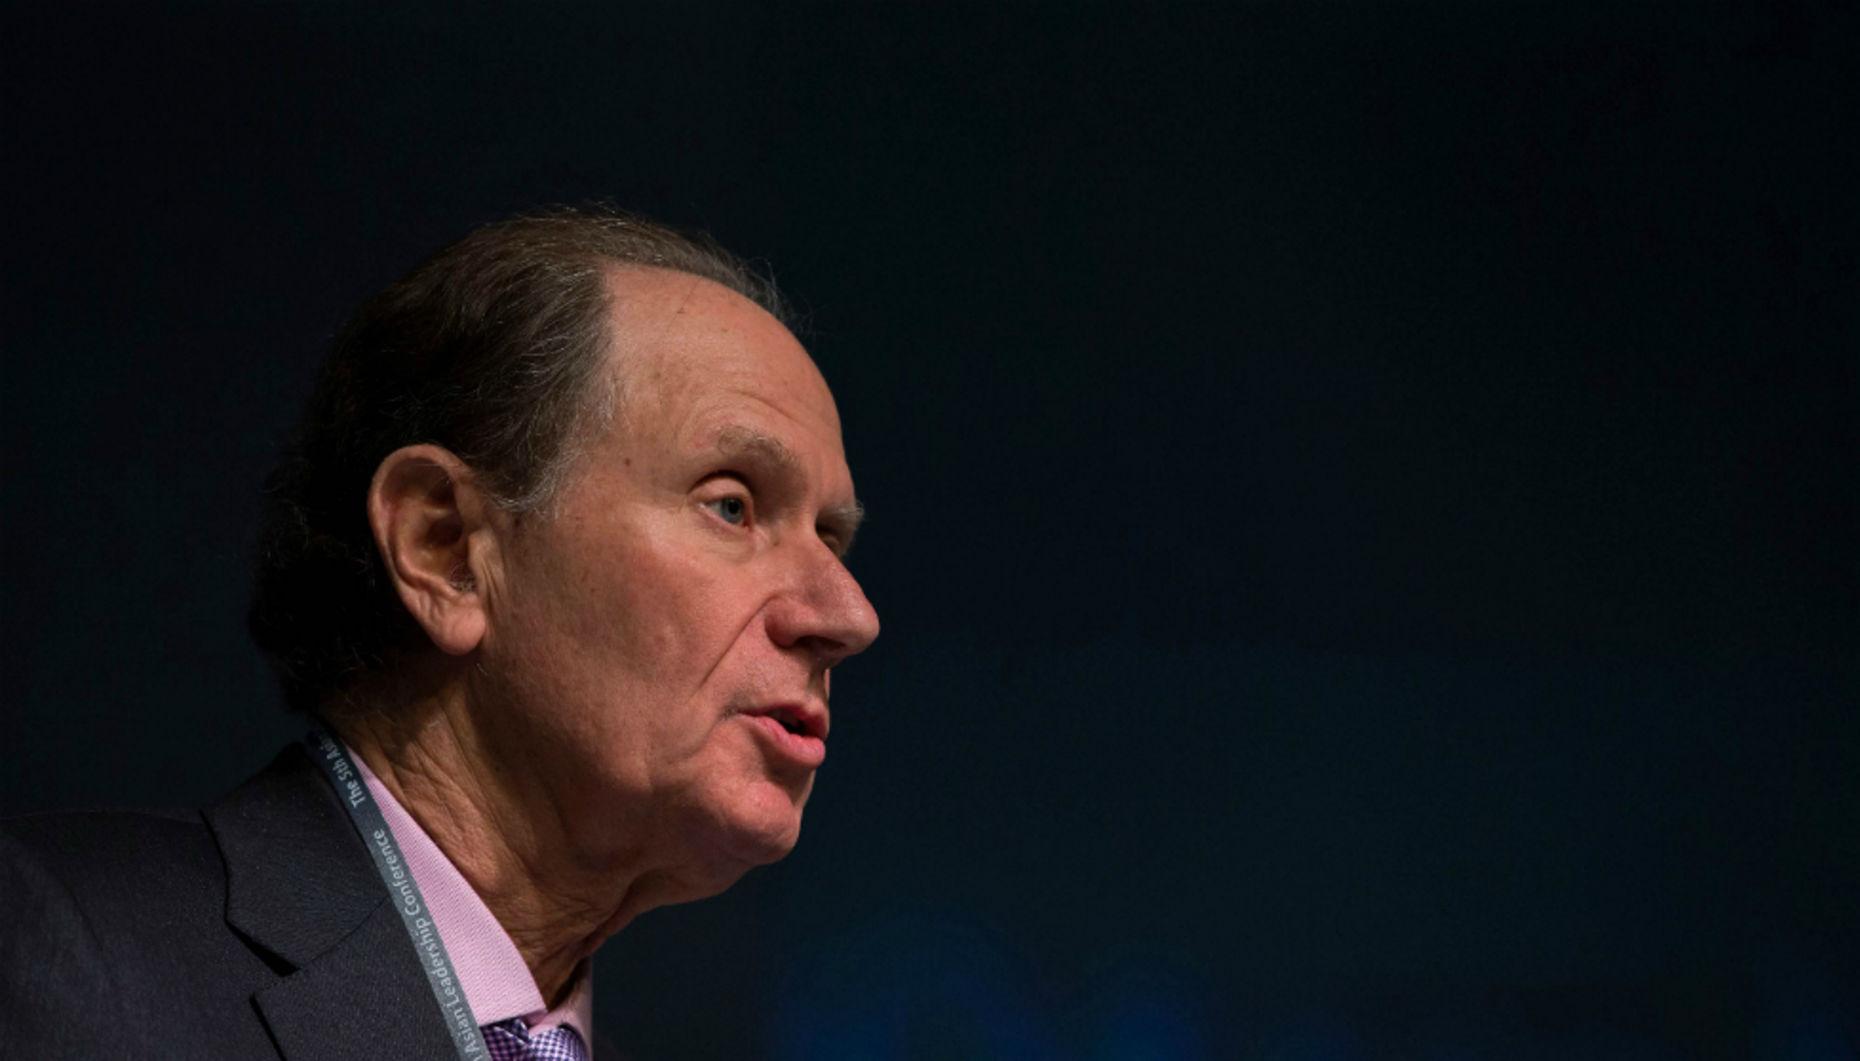 David Bonderman, founding partner of TPG. Photo by Bloomberg.